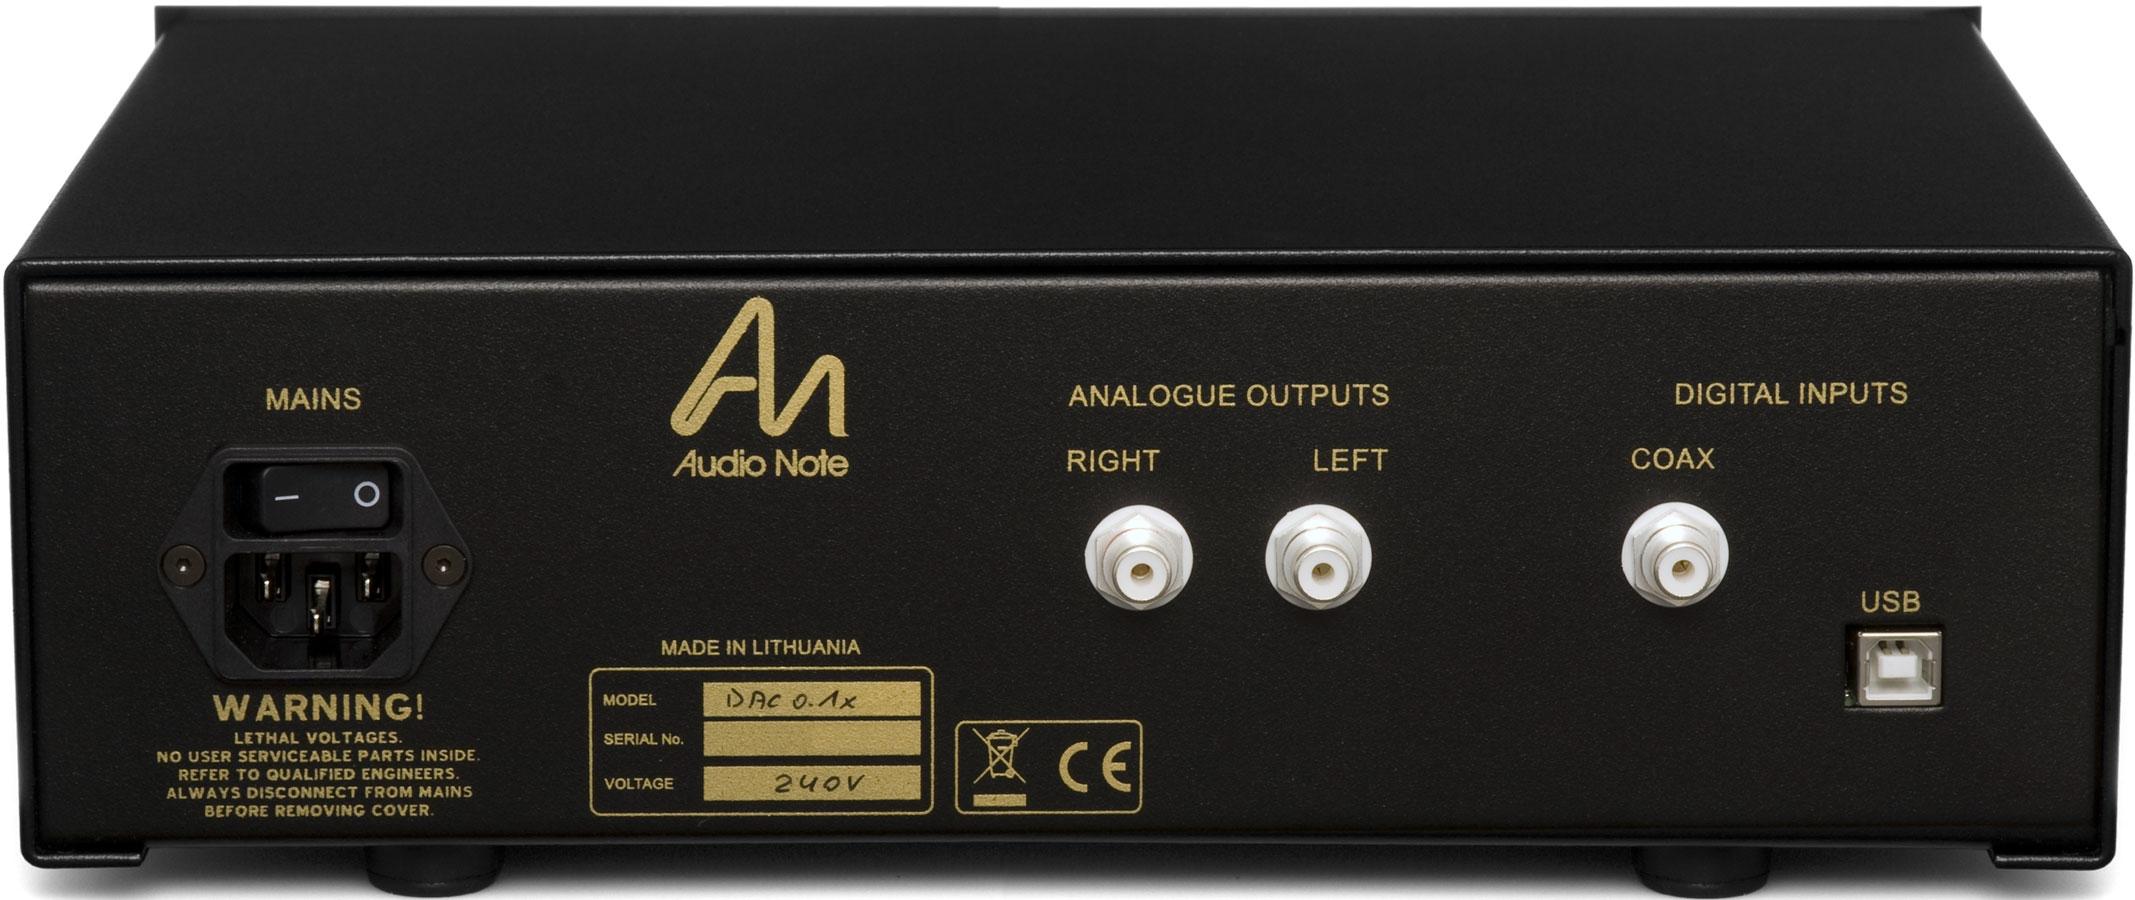 Audio Note UK DAC 0 1x Review - Dagogo